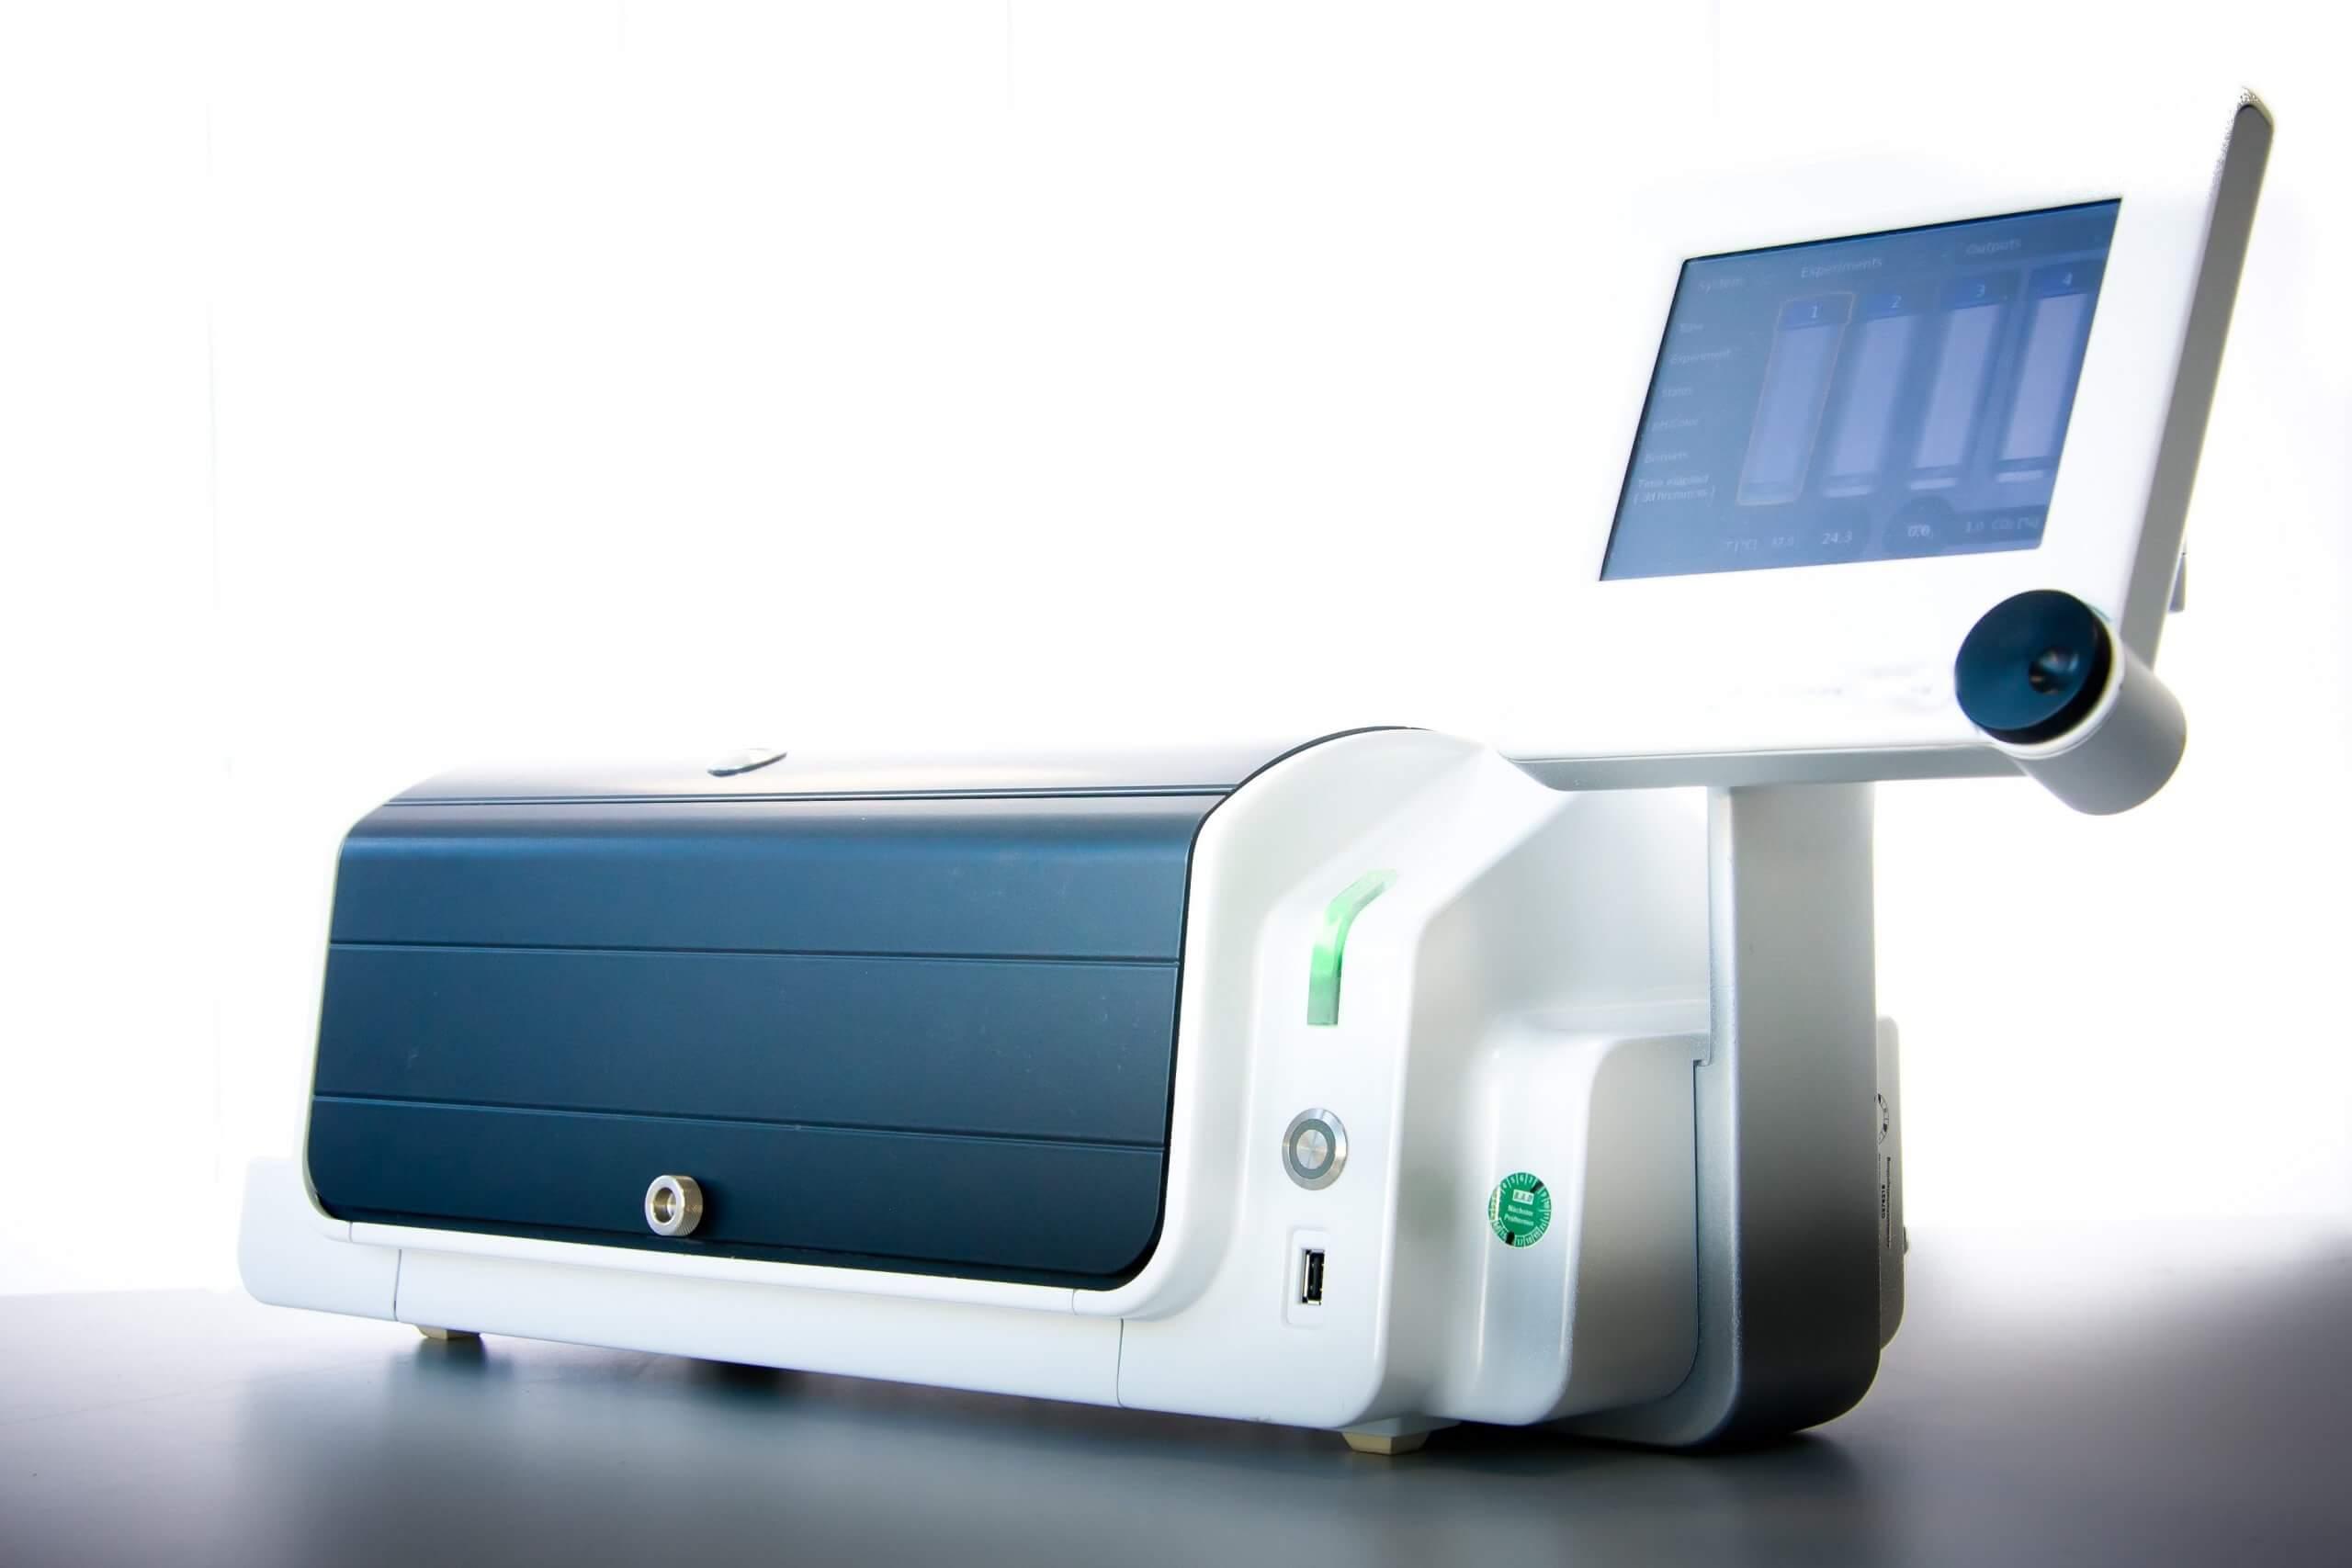 3D Culture Incubator CERO 3D